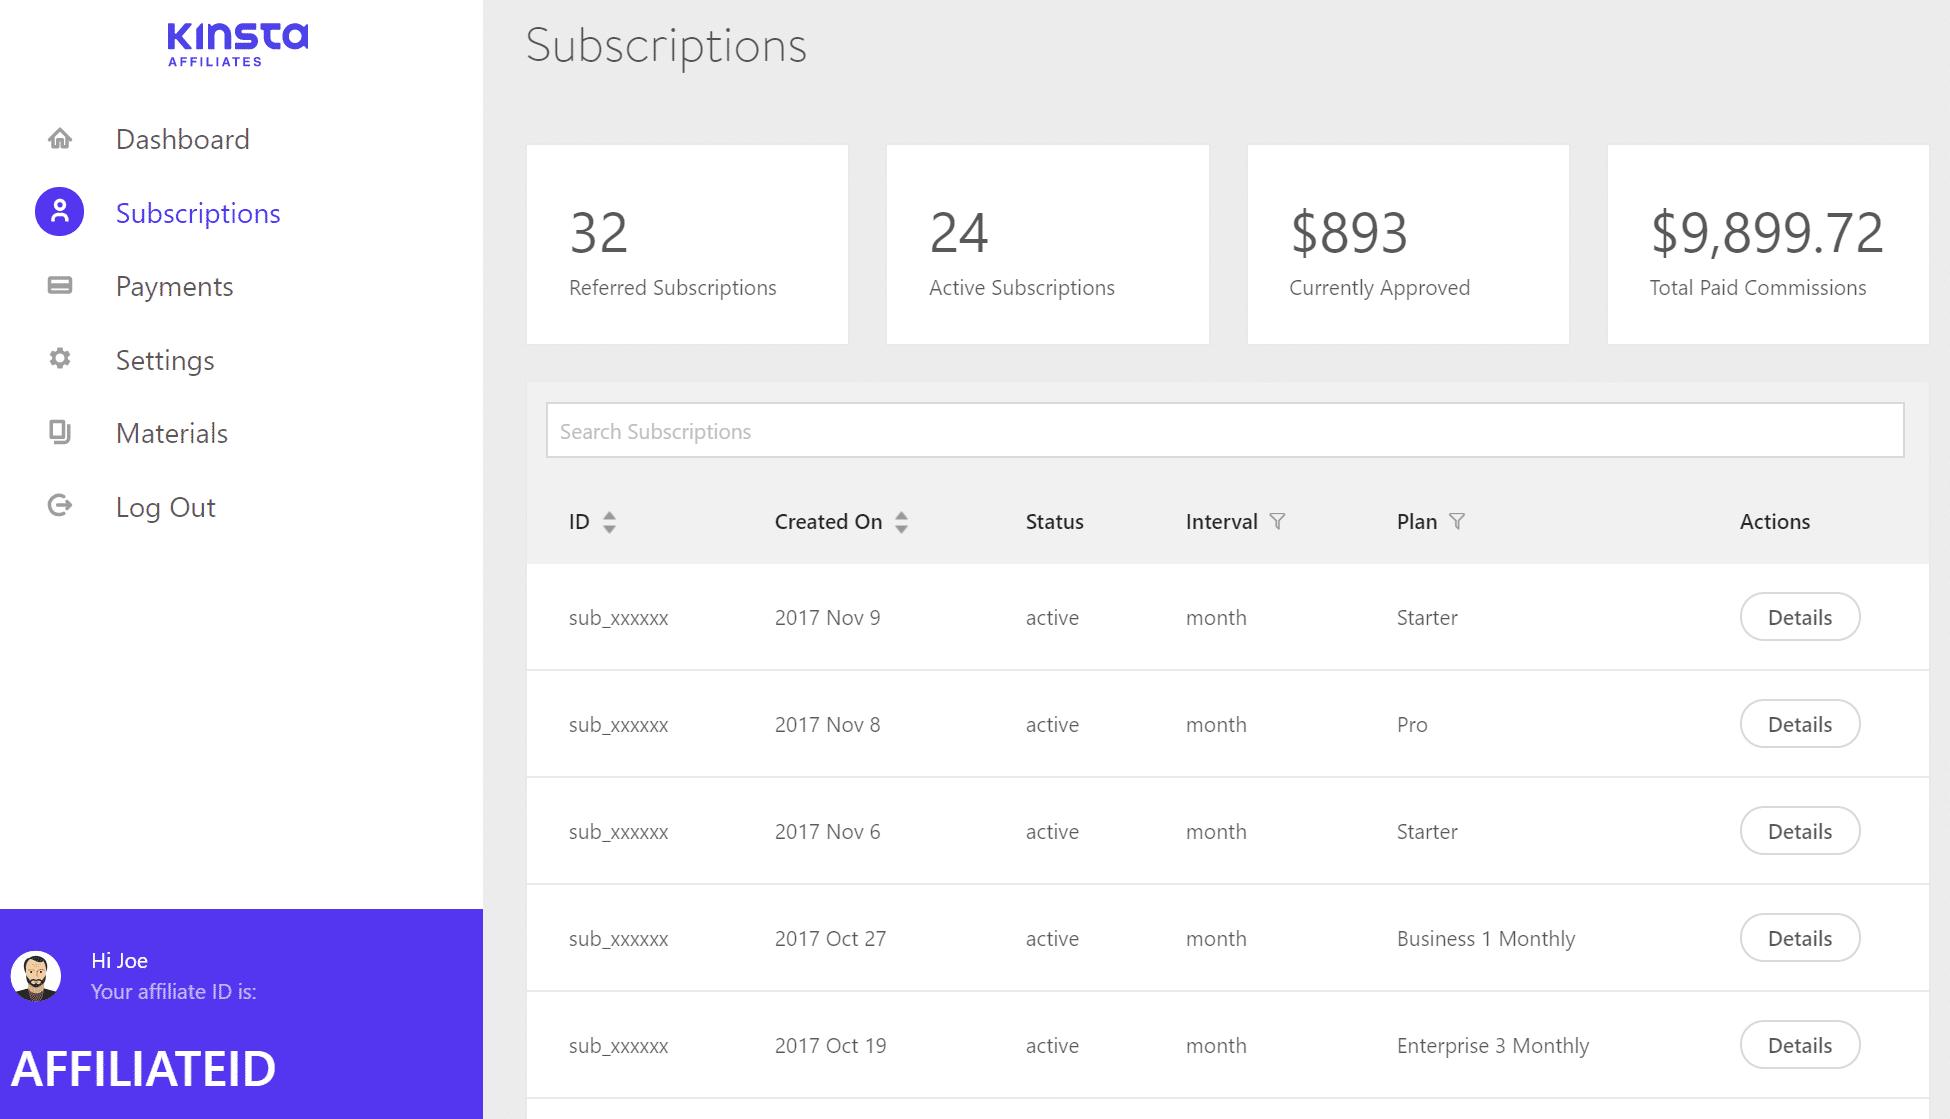 Kinsta affiliate subscriptions